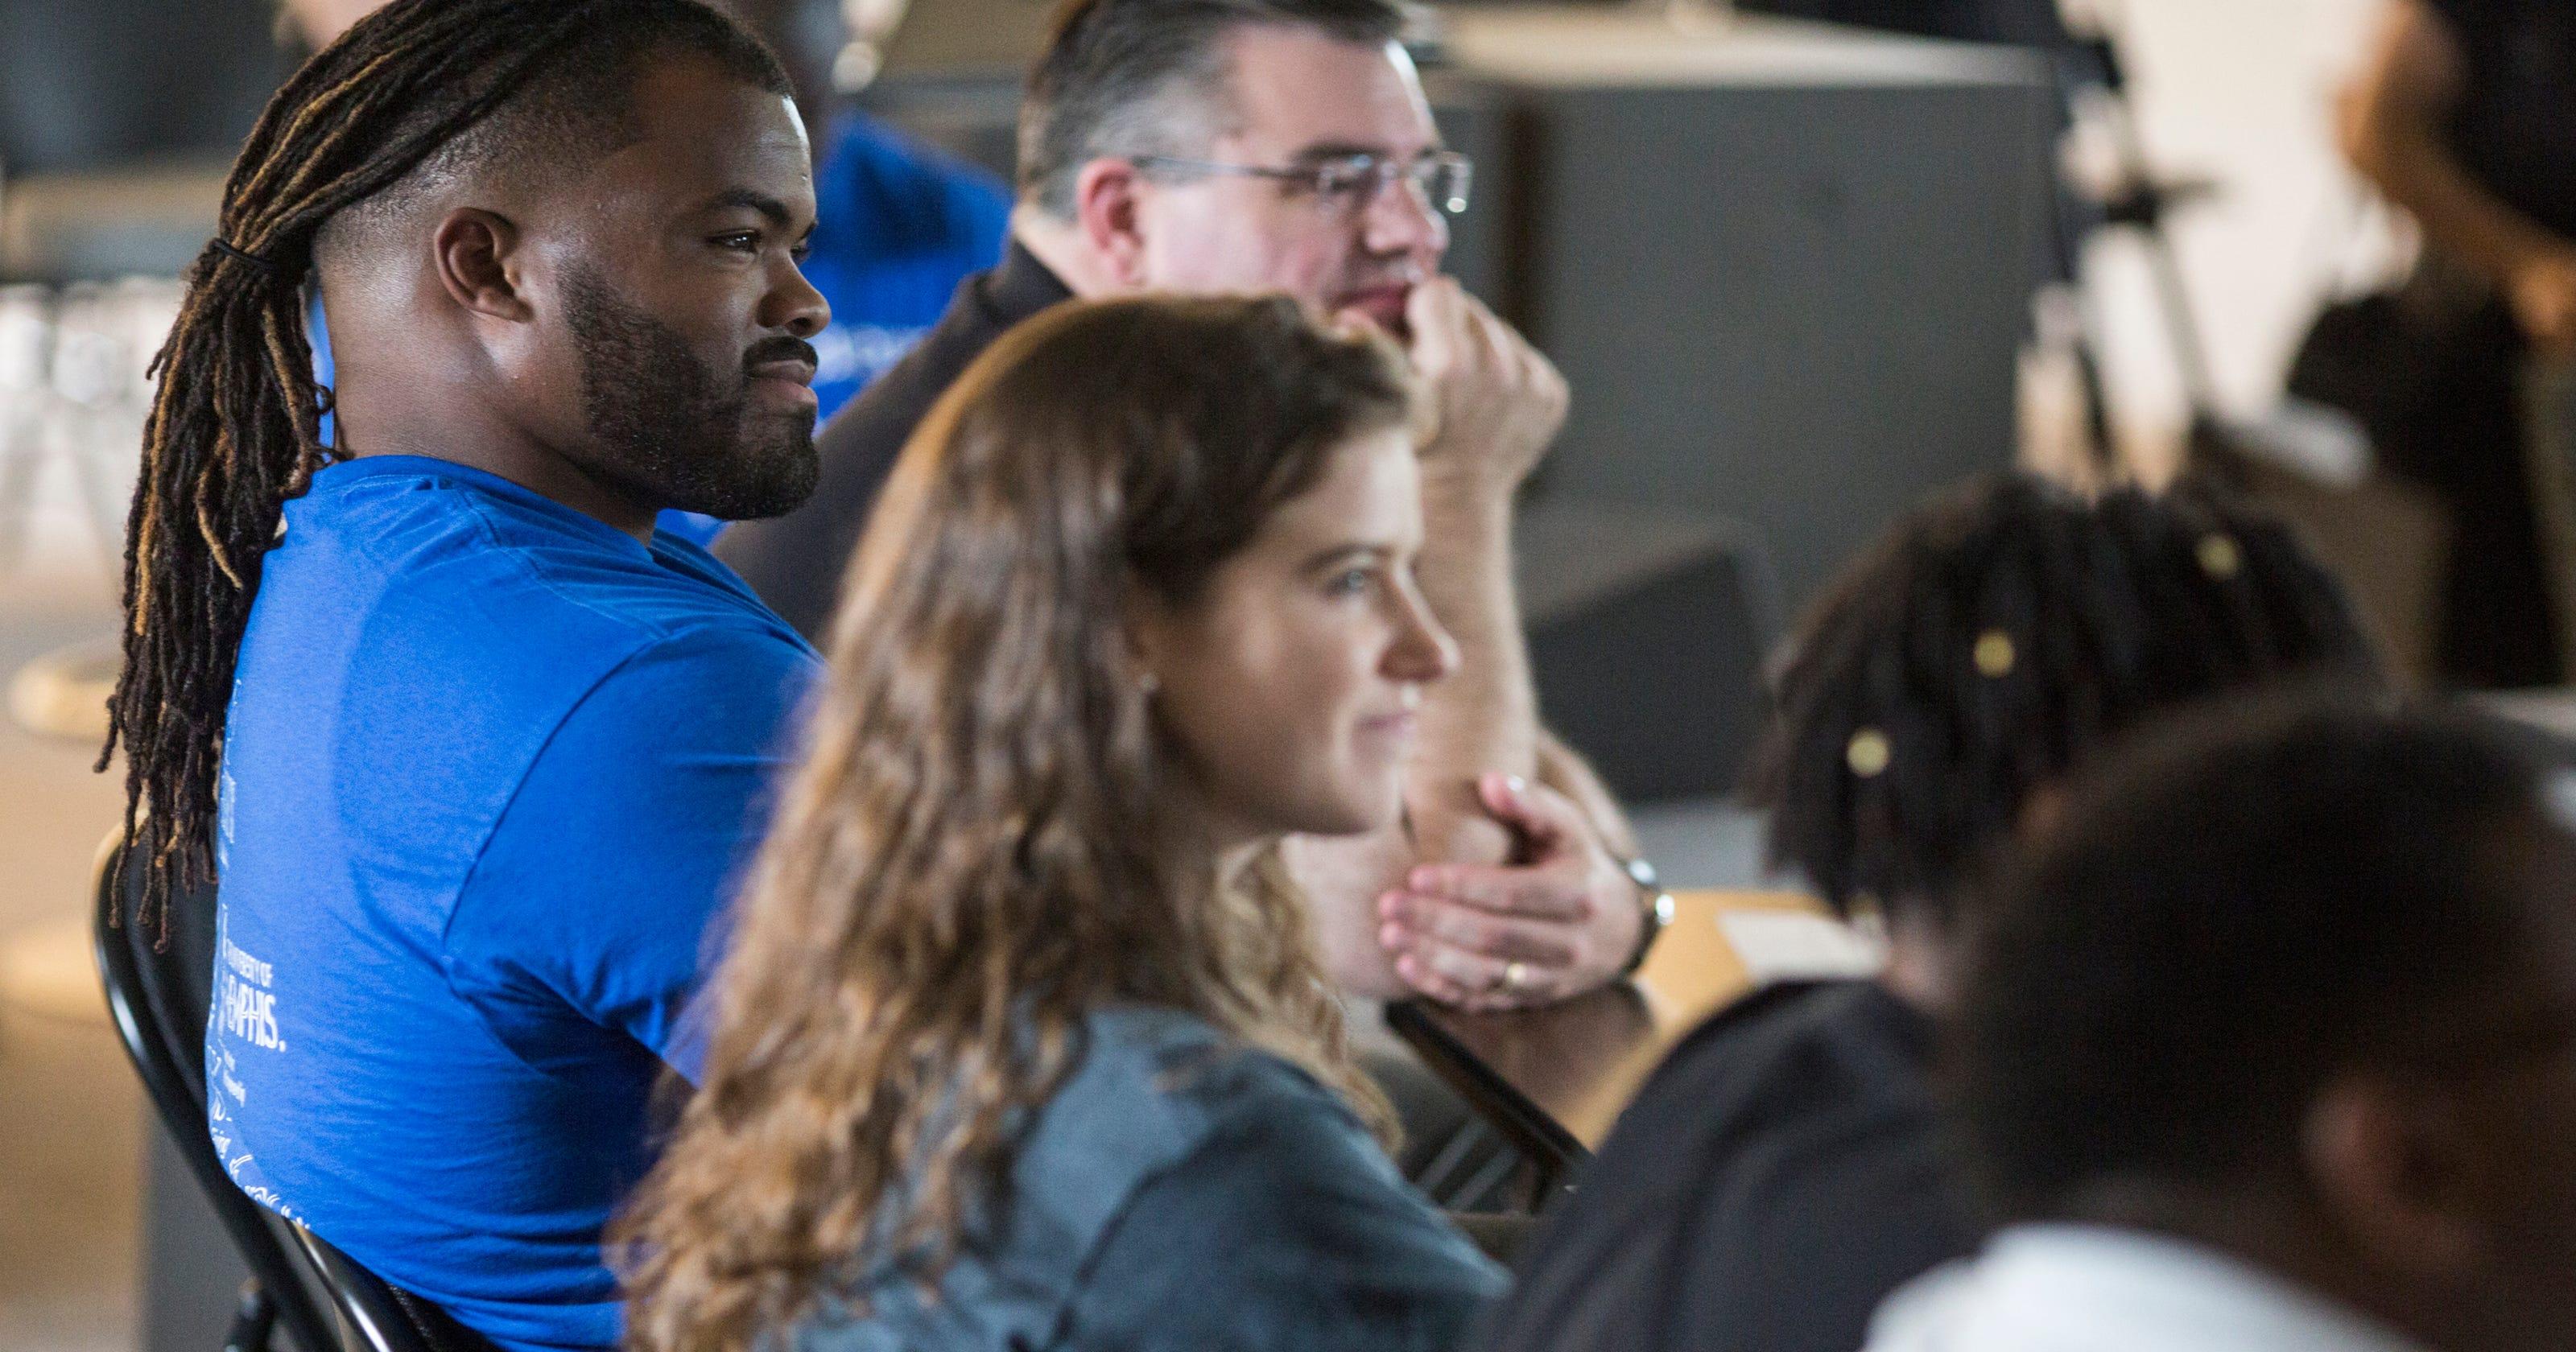 b0a8ca9ad Carolina Panthers: Dontari Poe returns to Memphis with entrepreneur,  football camps